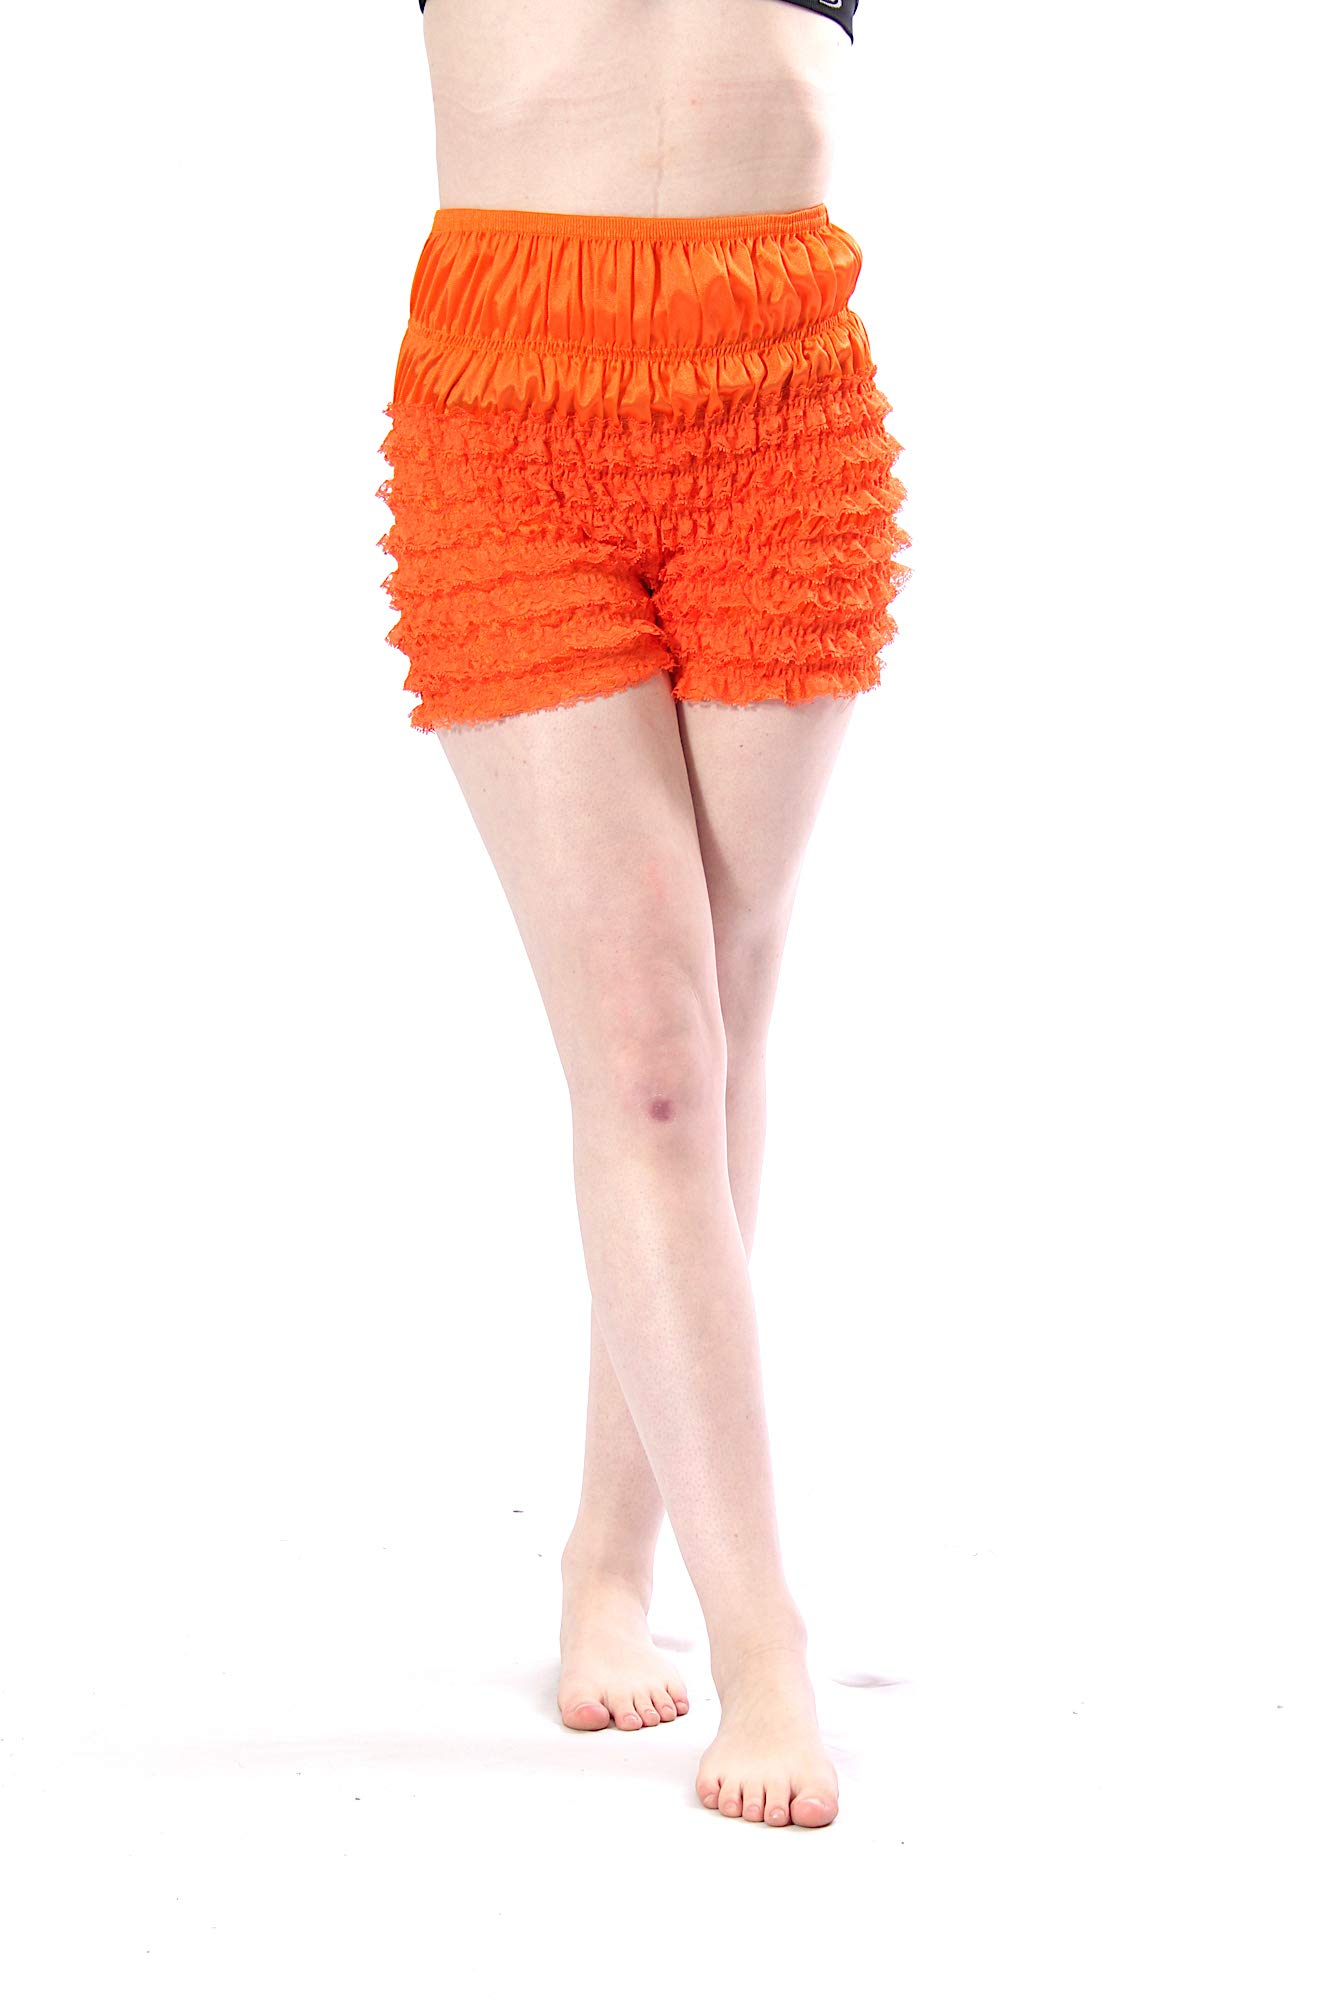 Malco Modes Womens Sexy Ruffle Panties Tanga Dance Bloomers Sissy Booty Shorts (Orange, X-Small) by Malco Modes